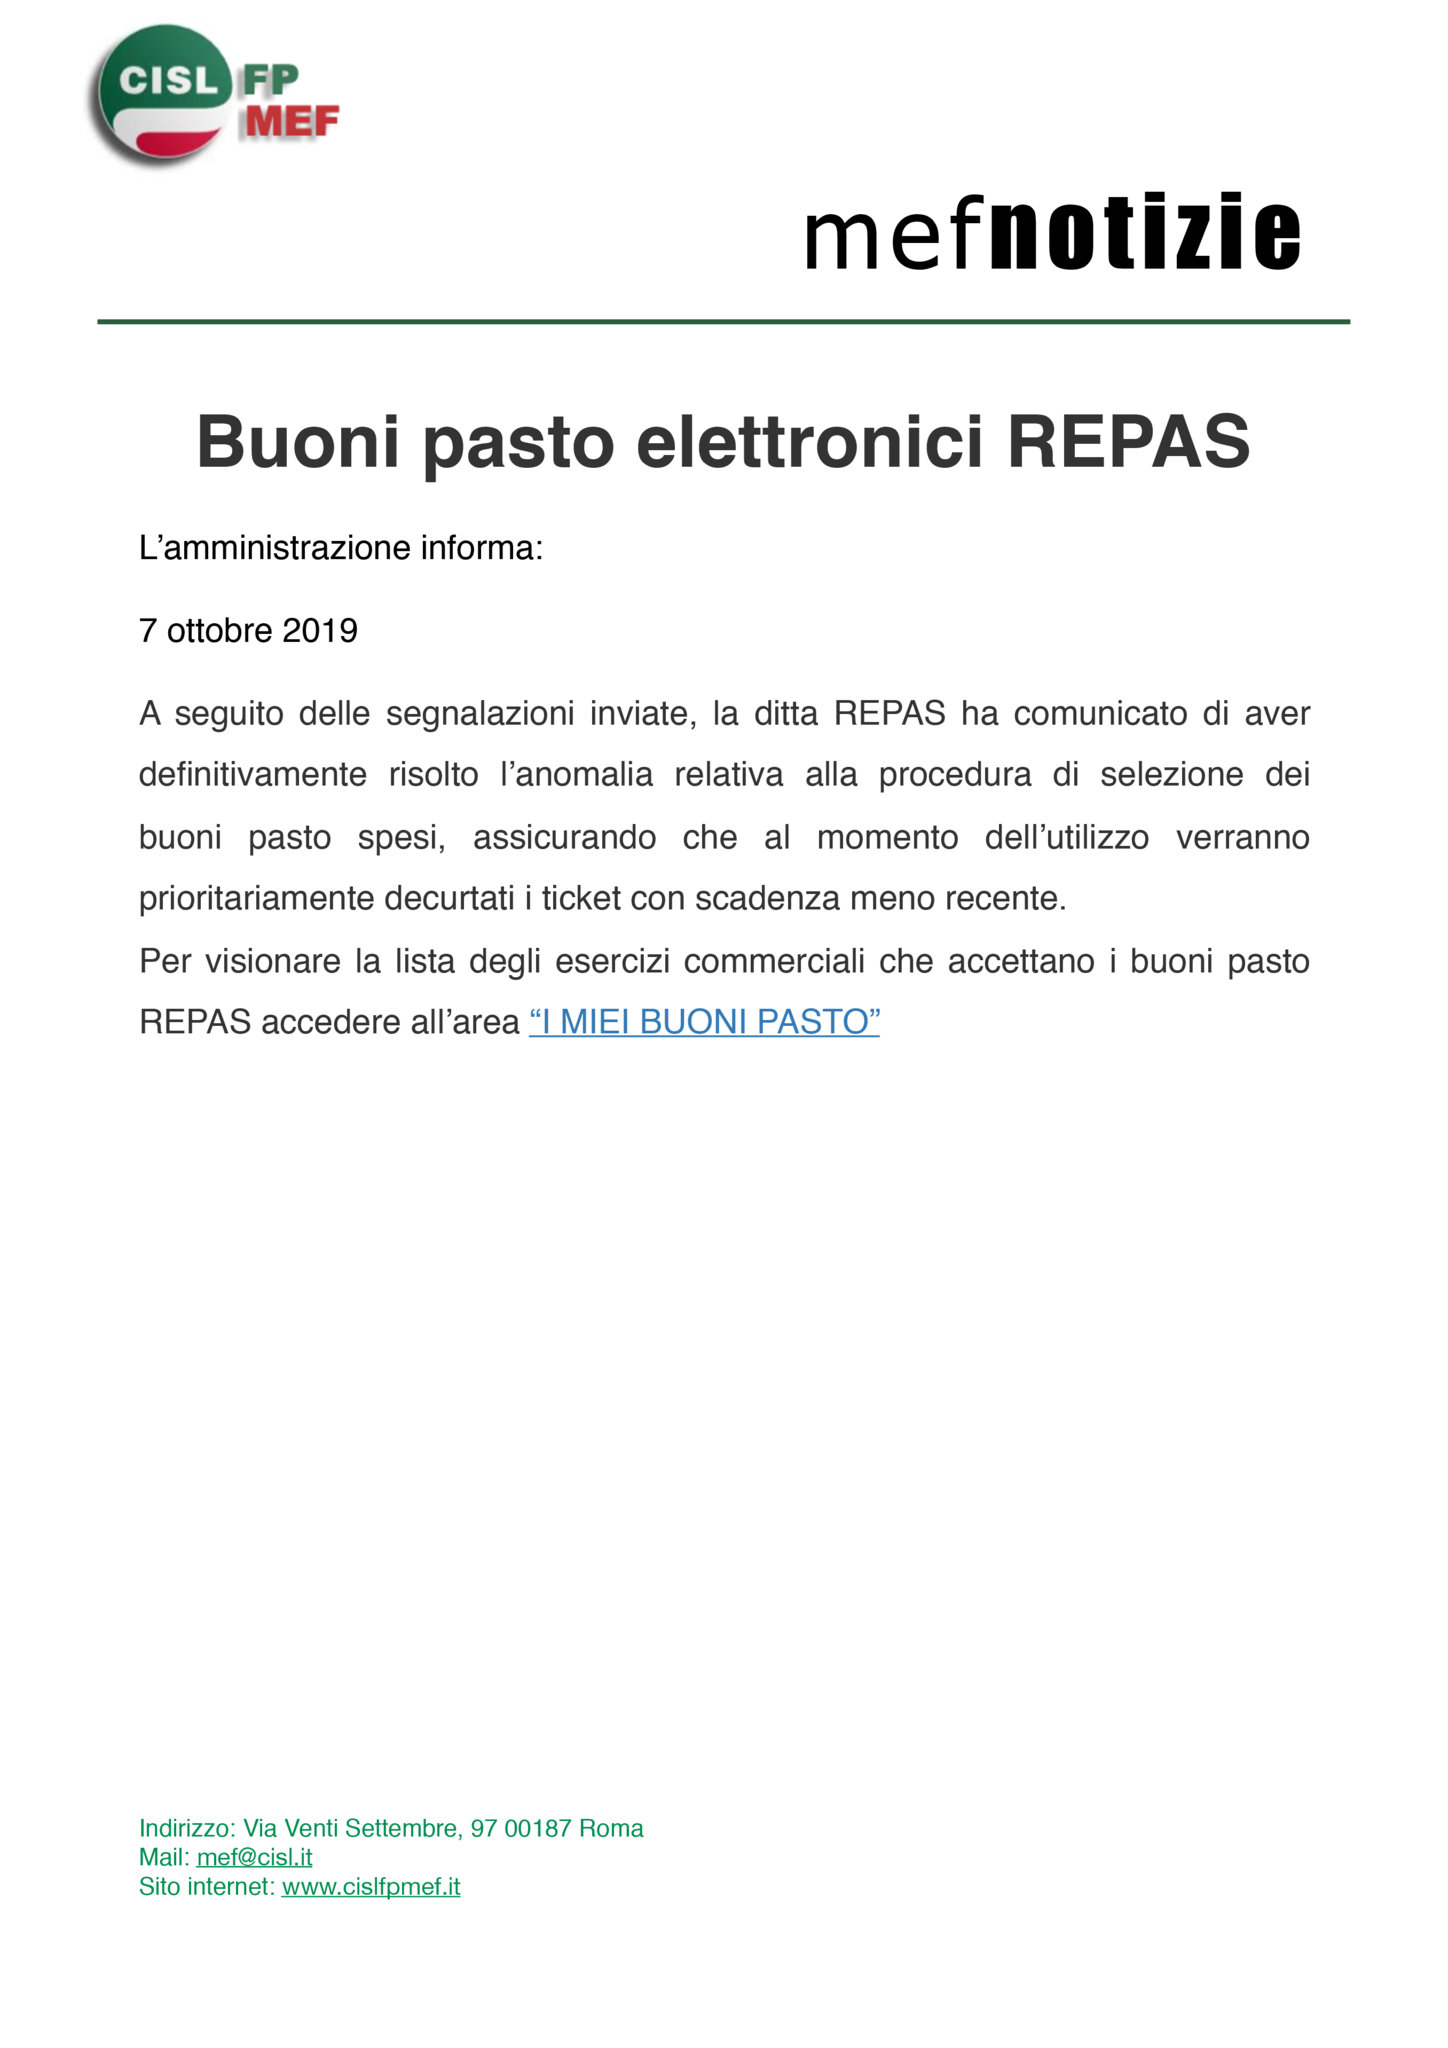 thumbnail of mef notizie – buoni pasto elettronici repas